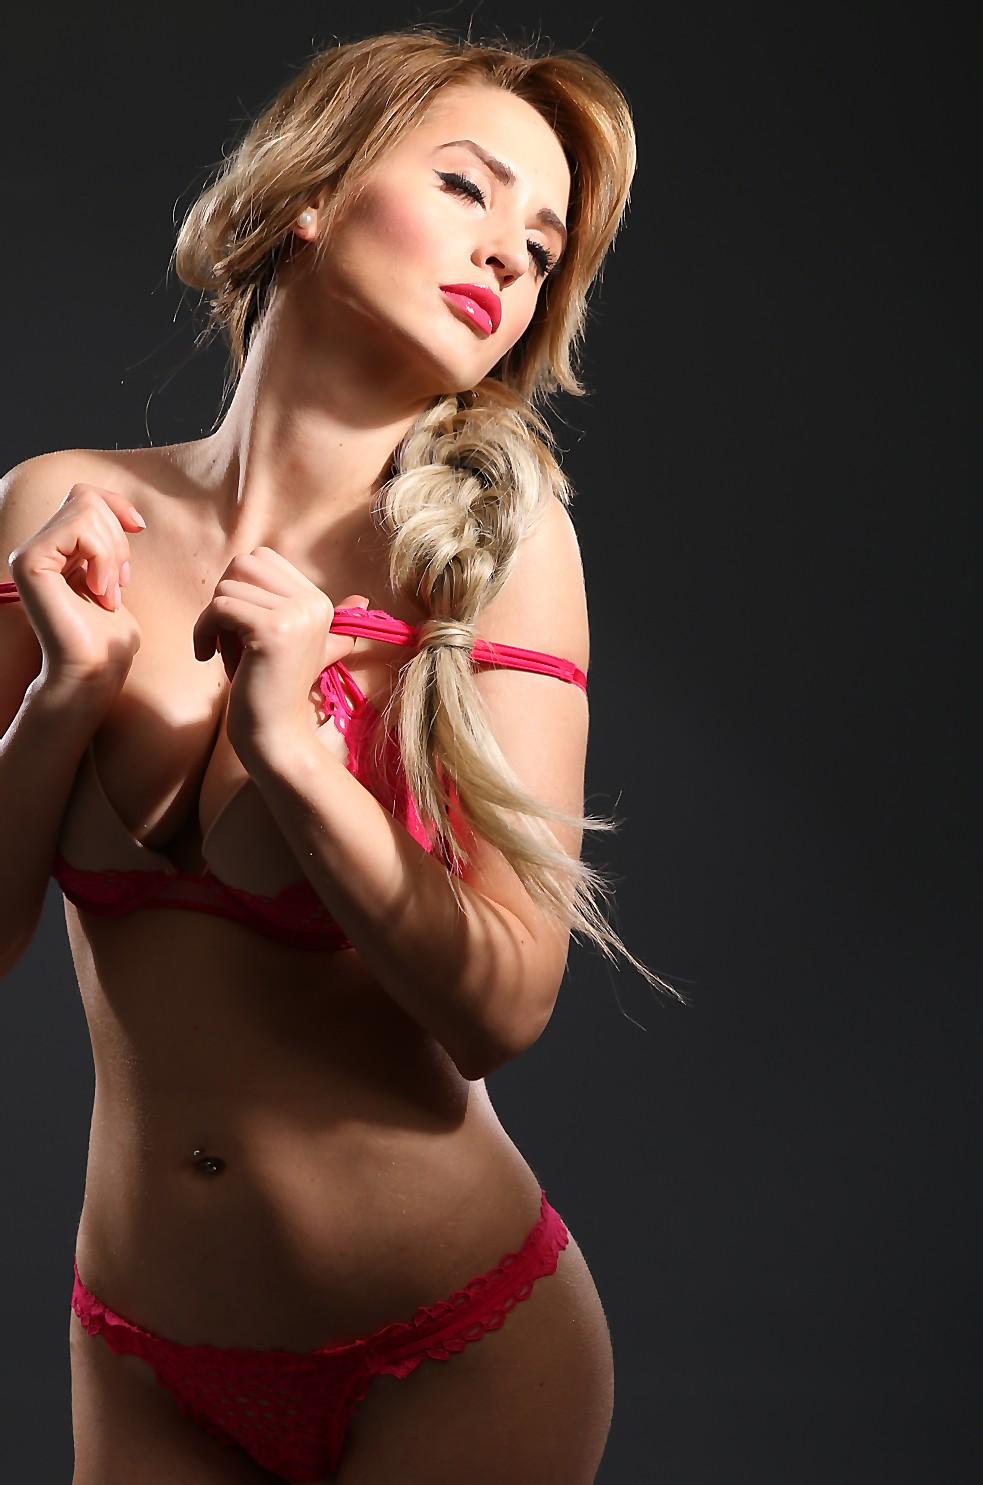 dating app escort bøsse service vip